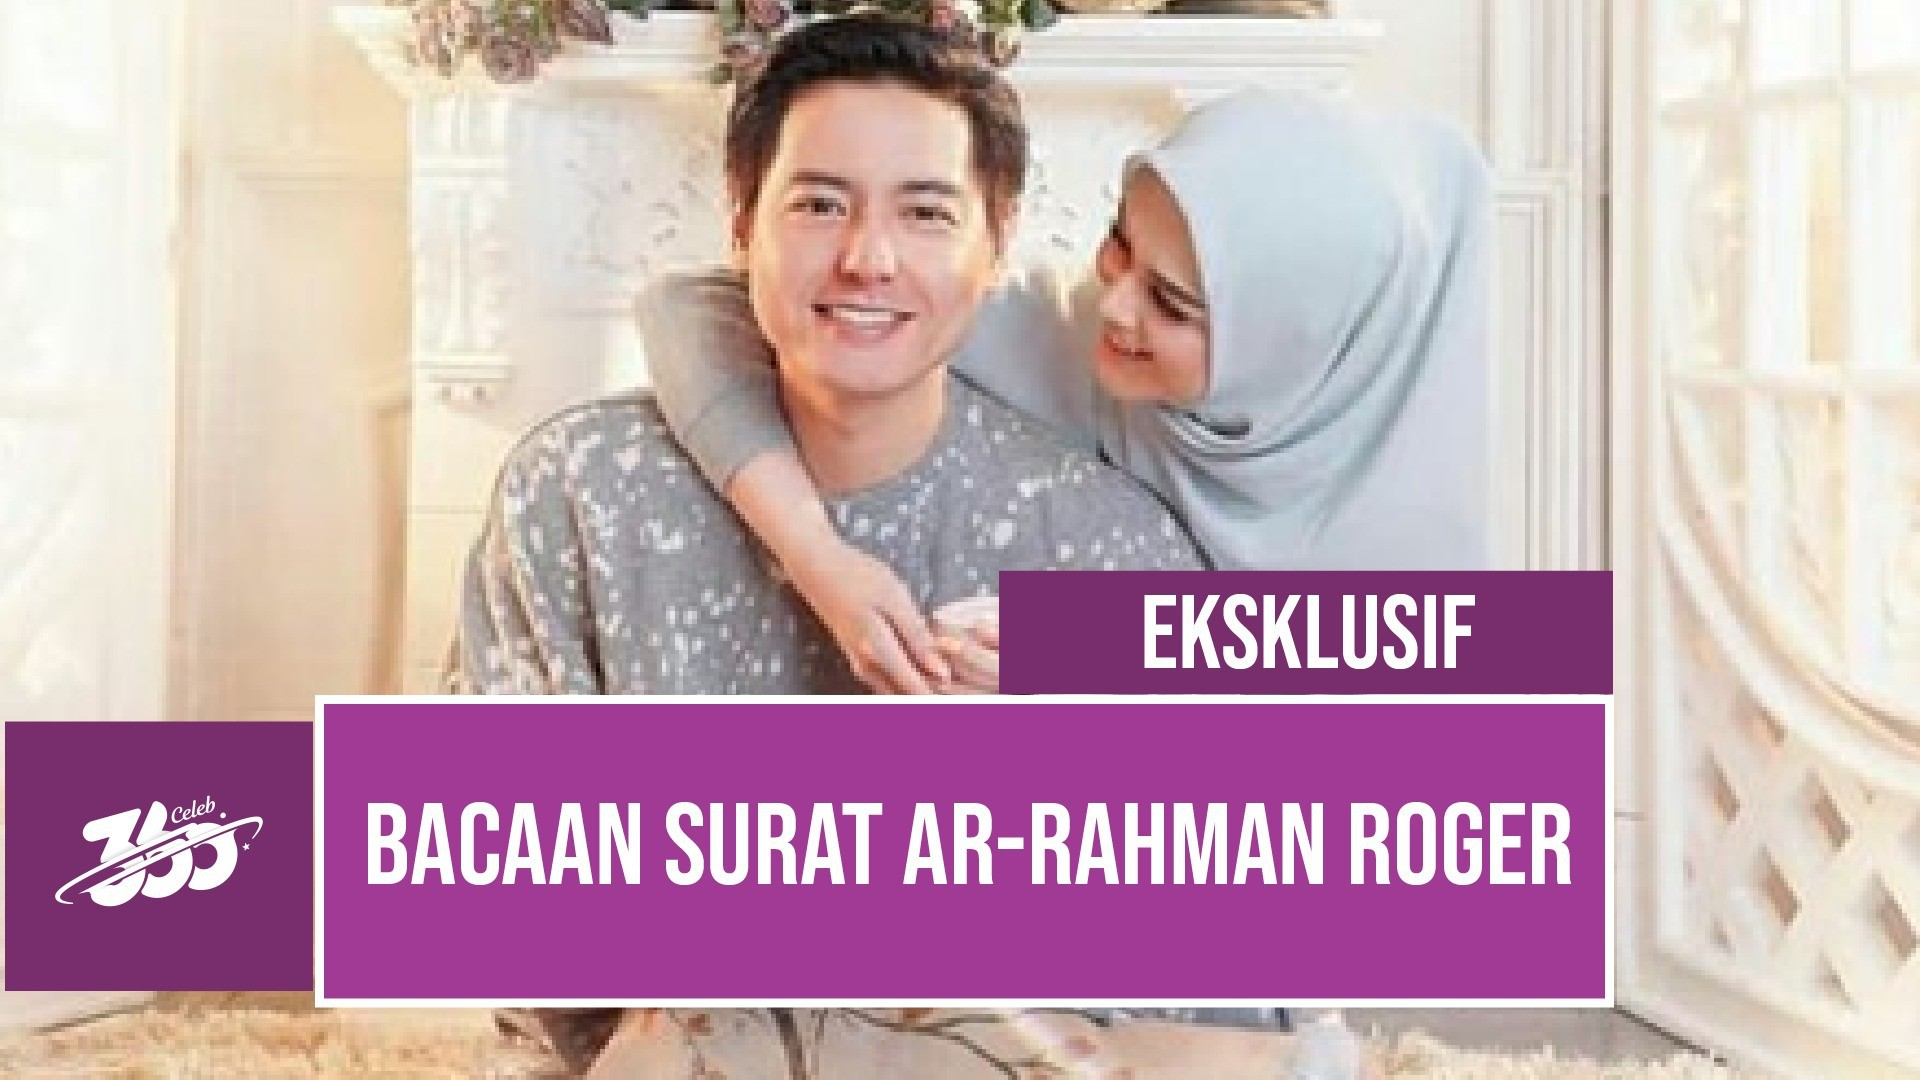 Esklusif Baru Jadi Mualaf Roger Danuarta Mengaji Surat Ar Rahman Ketika Menikahi Cut Meyriska Takdir Cinta